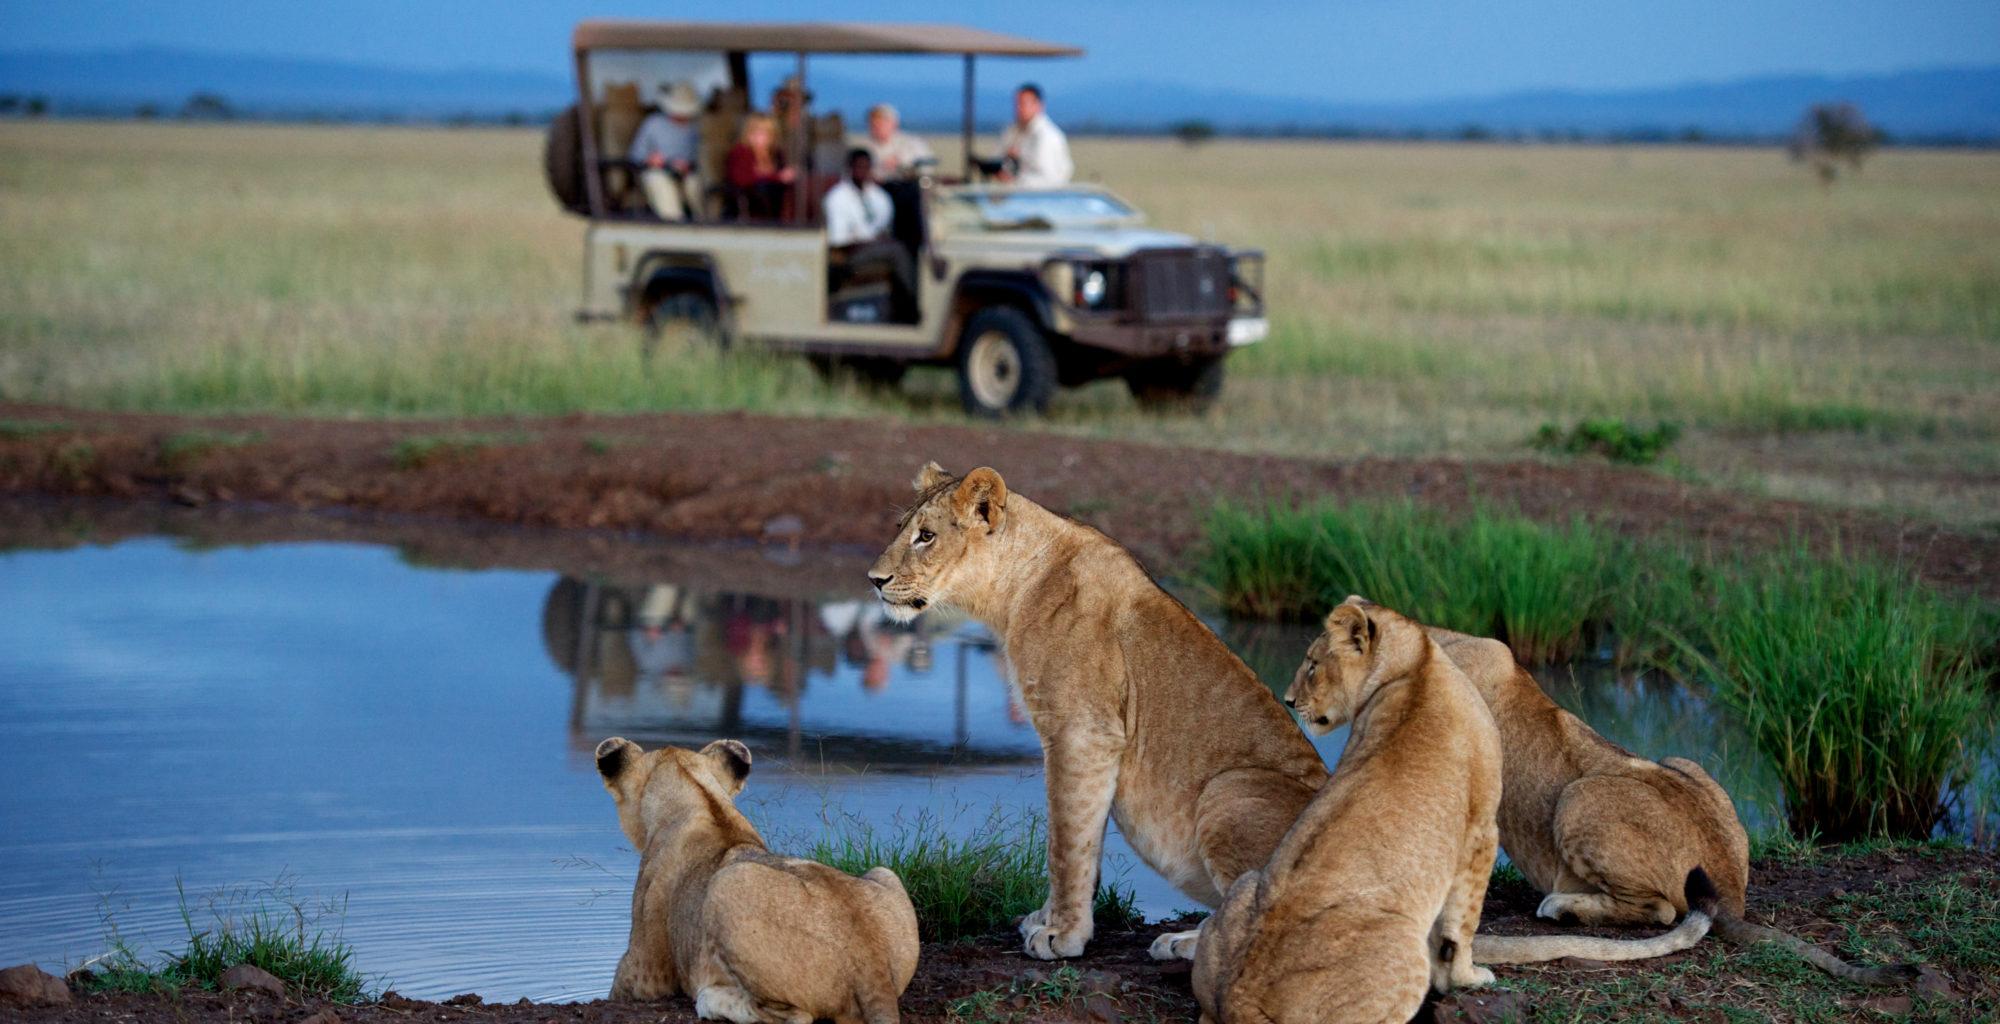 Tanzania-Singita-Serengeti-House-Game-Drive-Lions